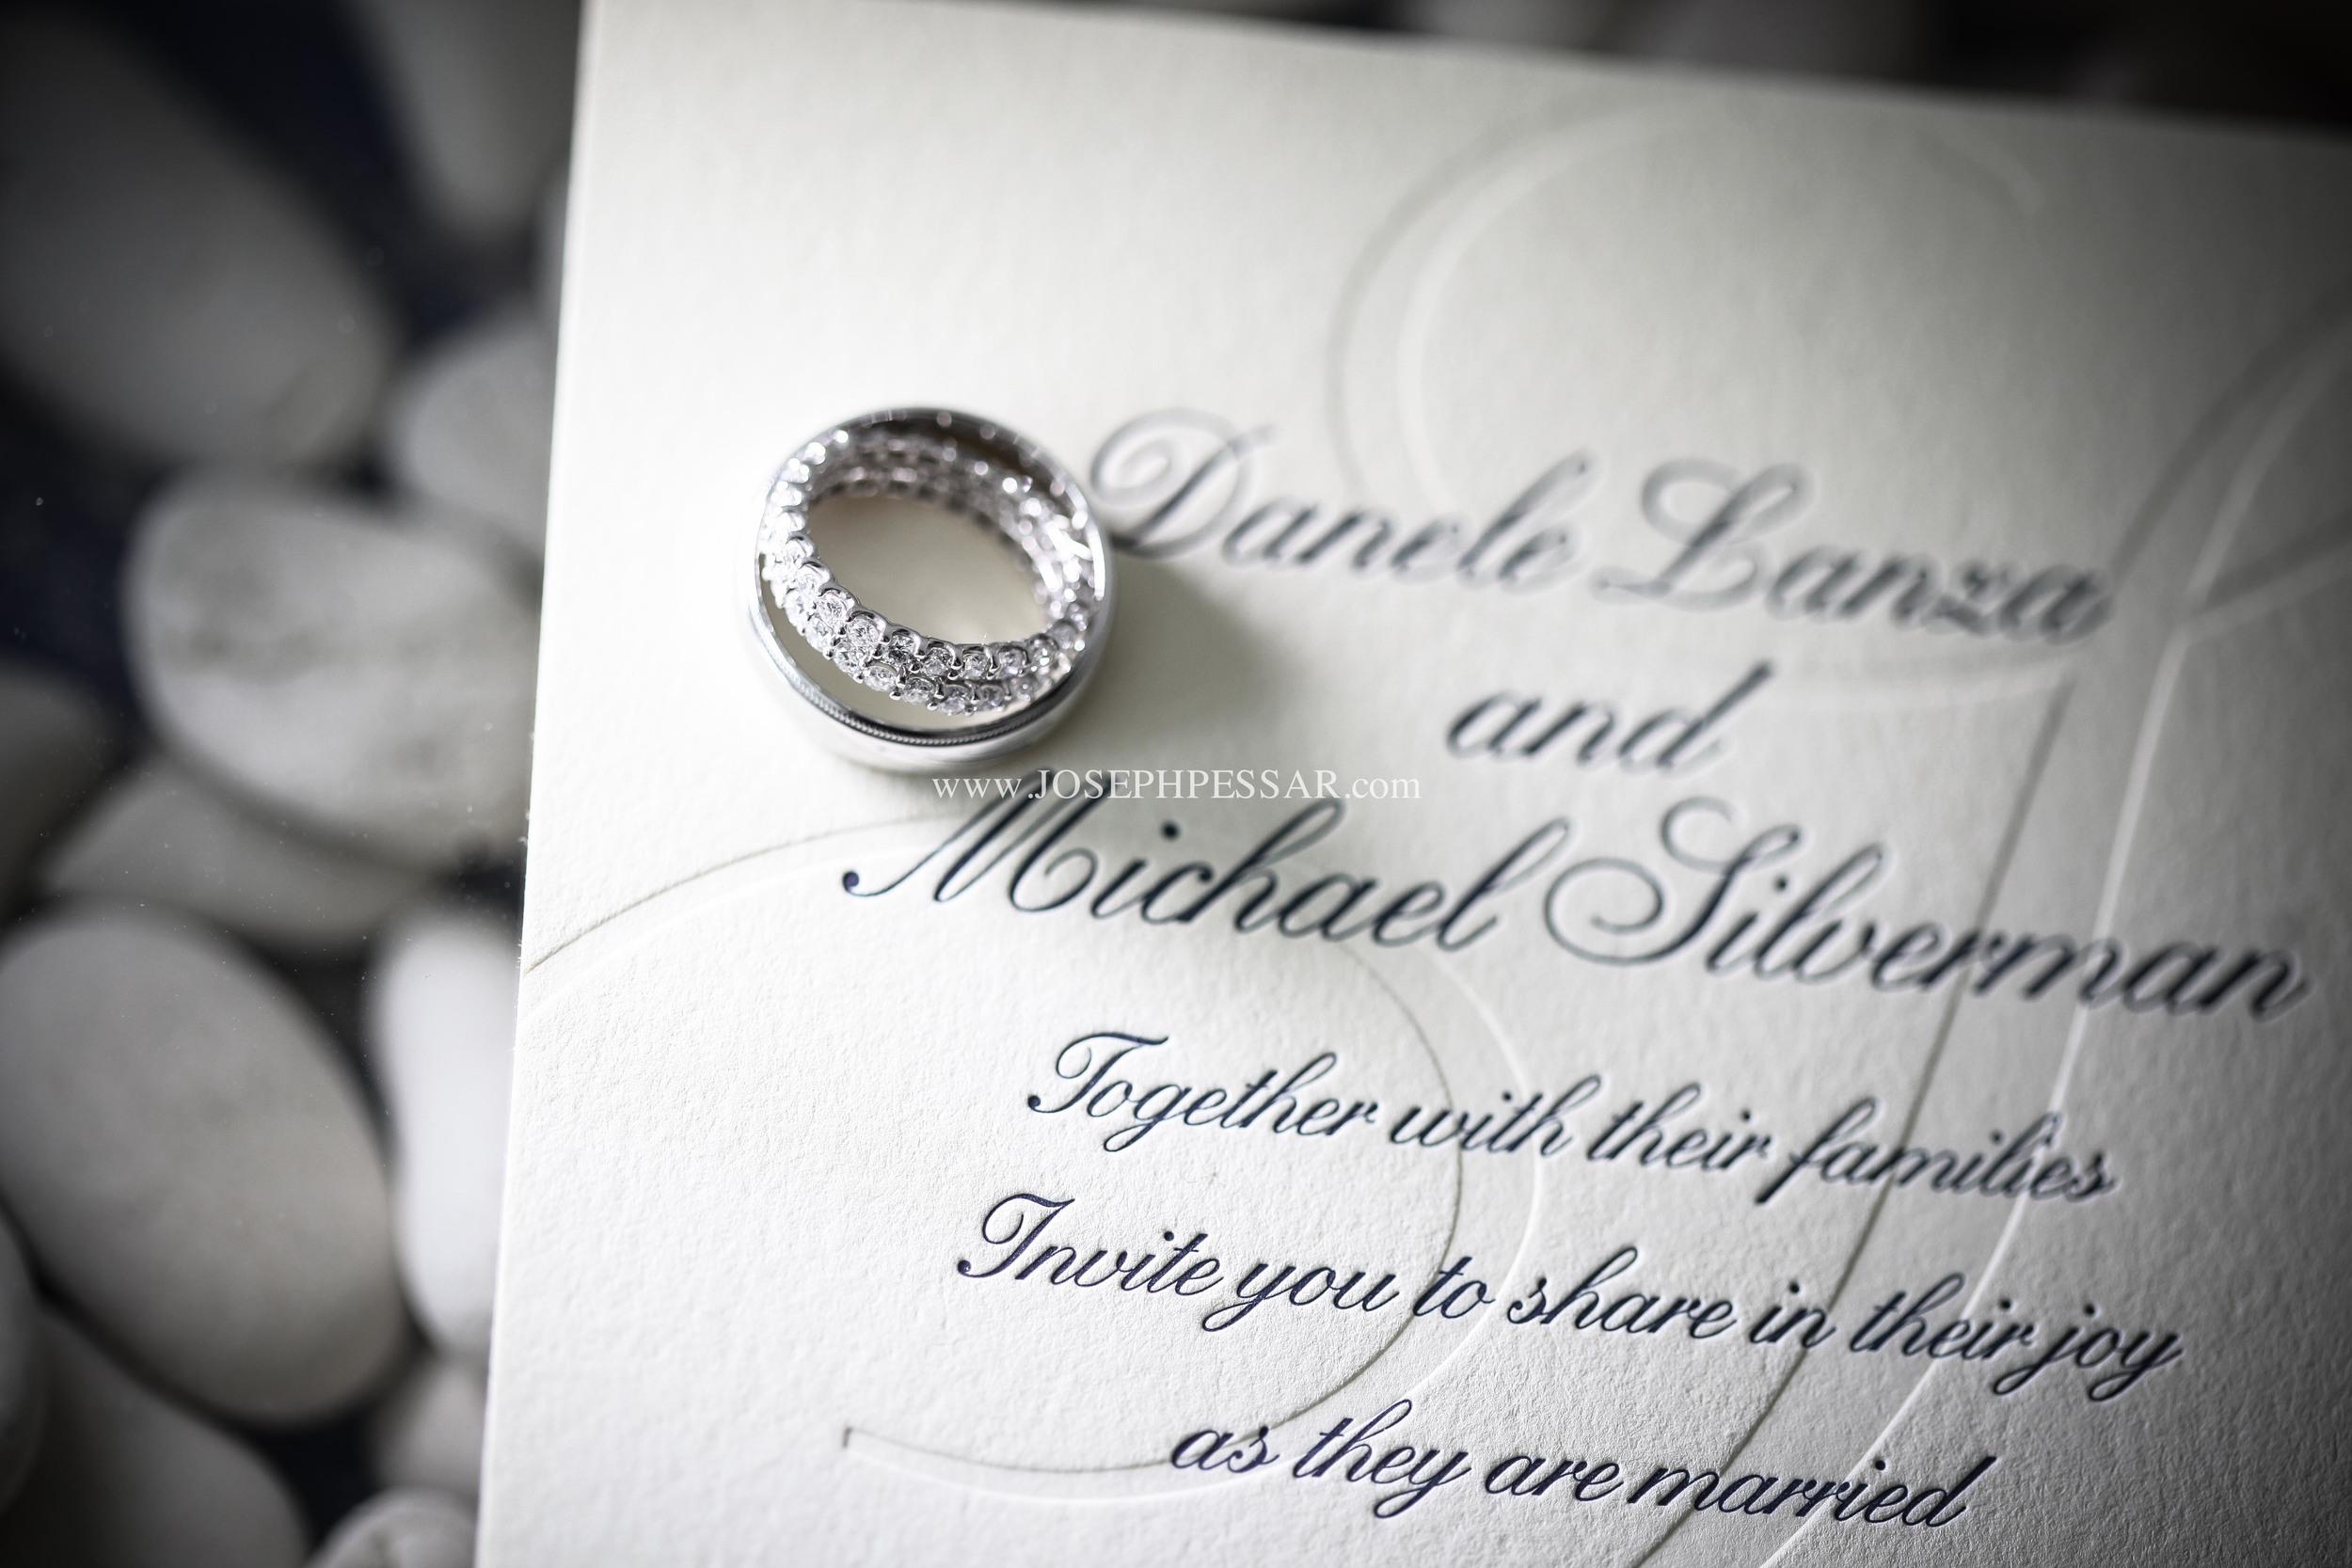 nyc_wedding_photographer0001.jpg